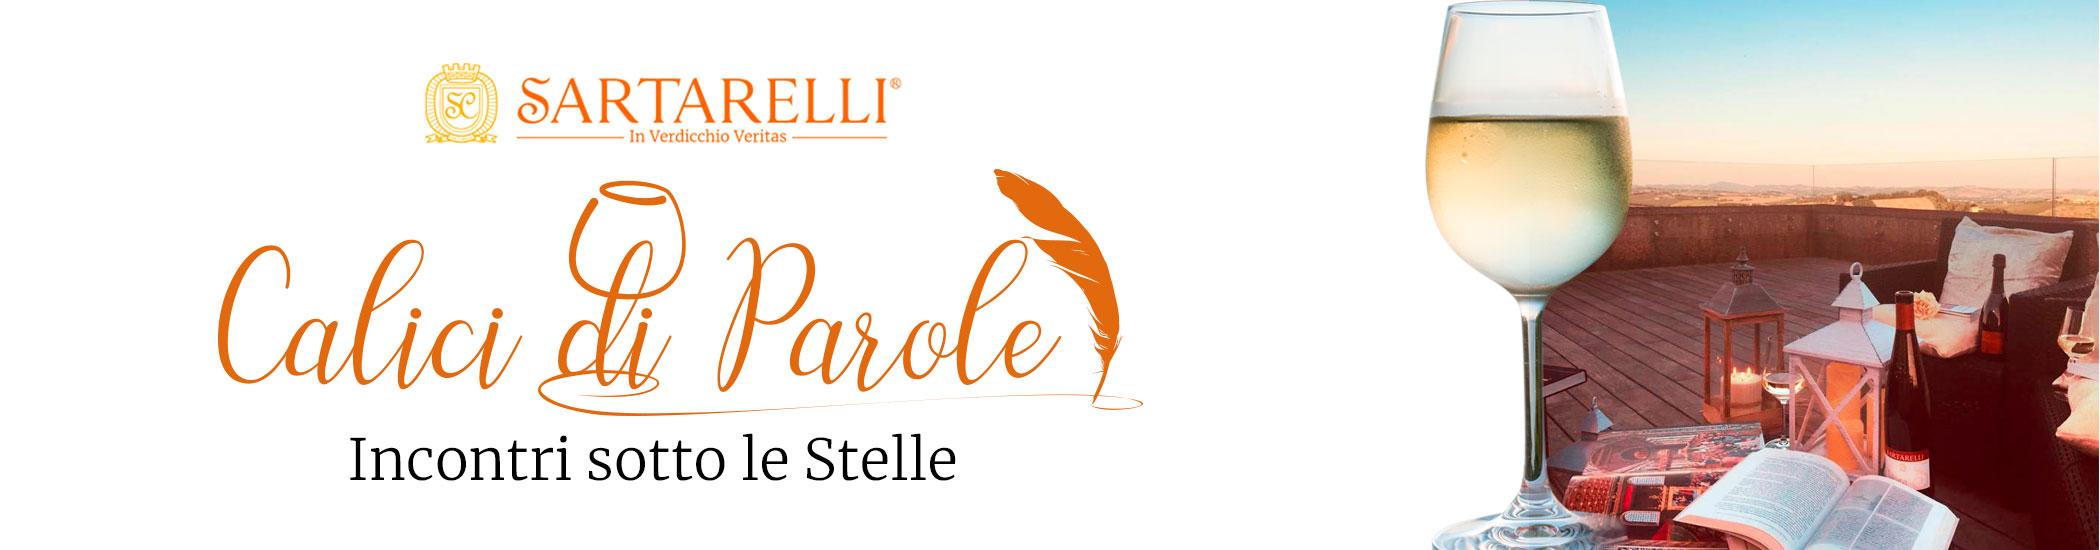 Calici di Parole – Meetings under the Stars